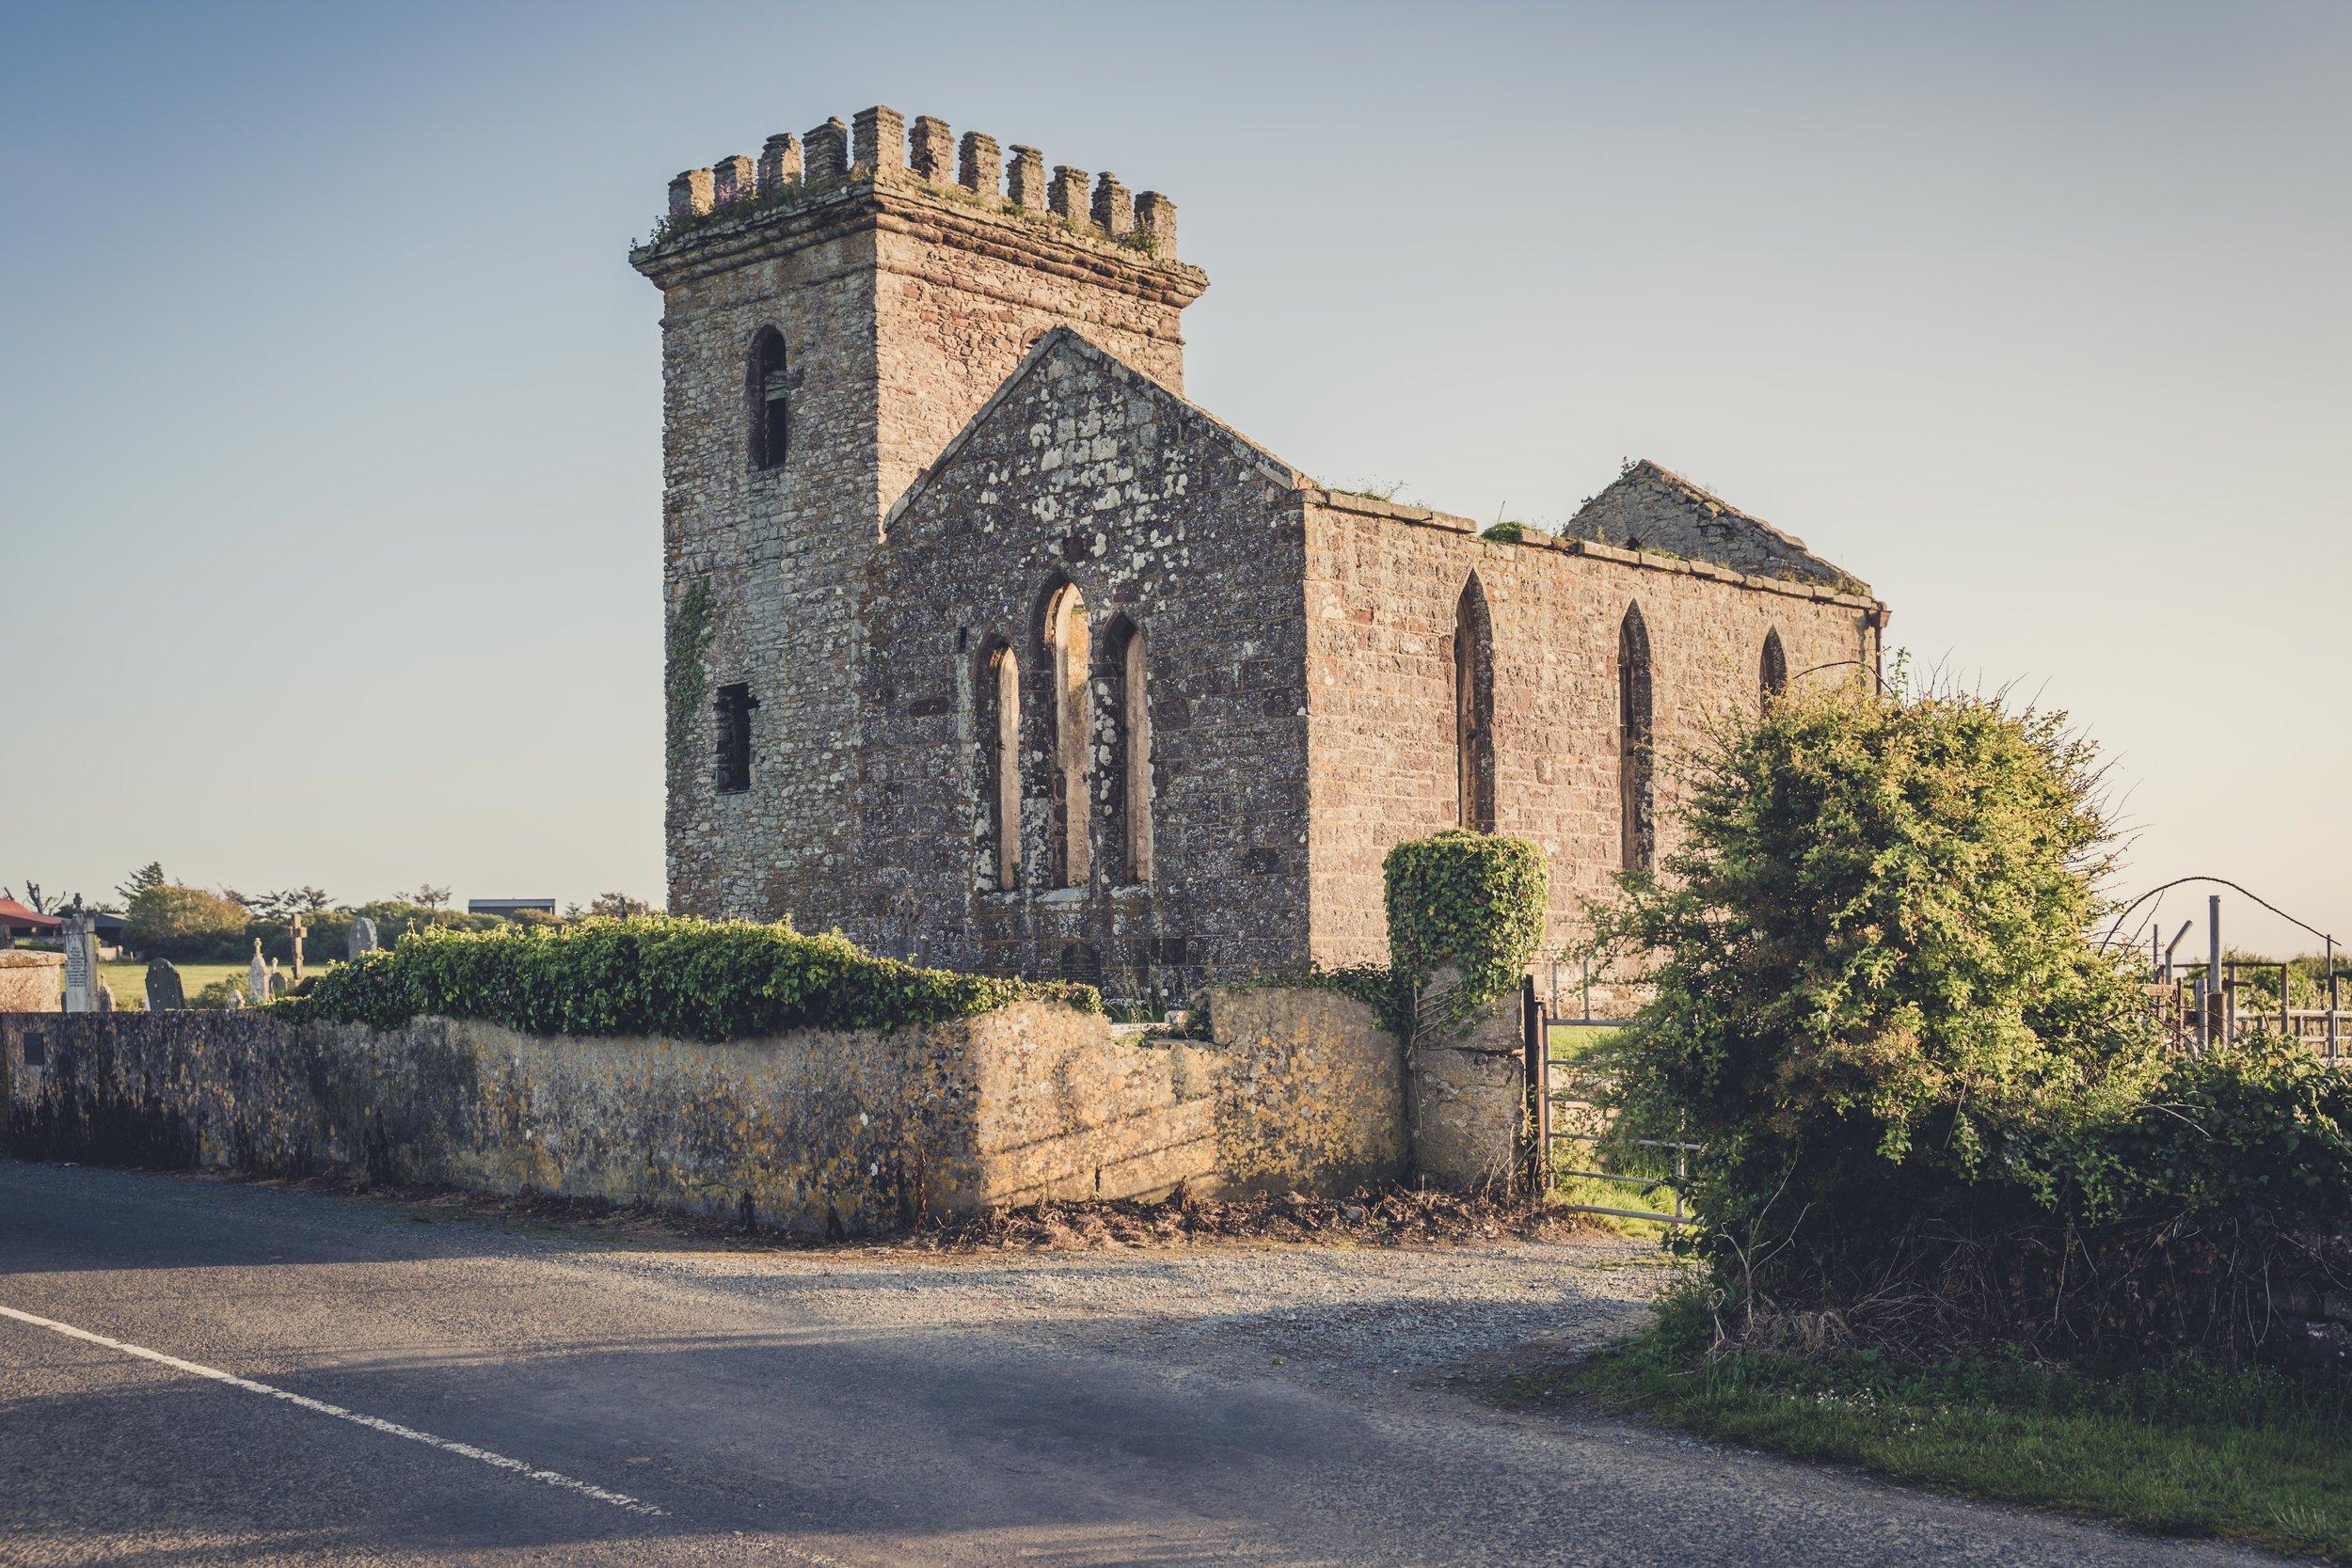 wexford ireland templars tower.jpg